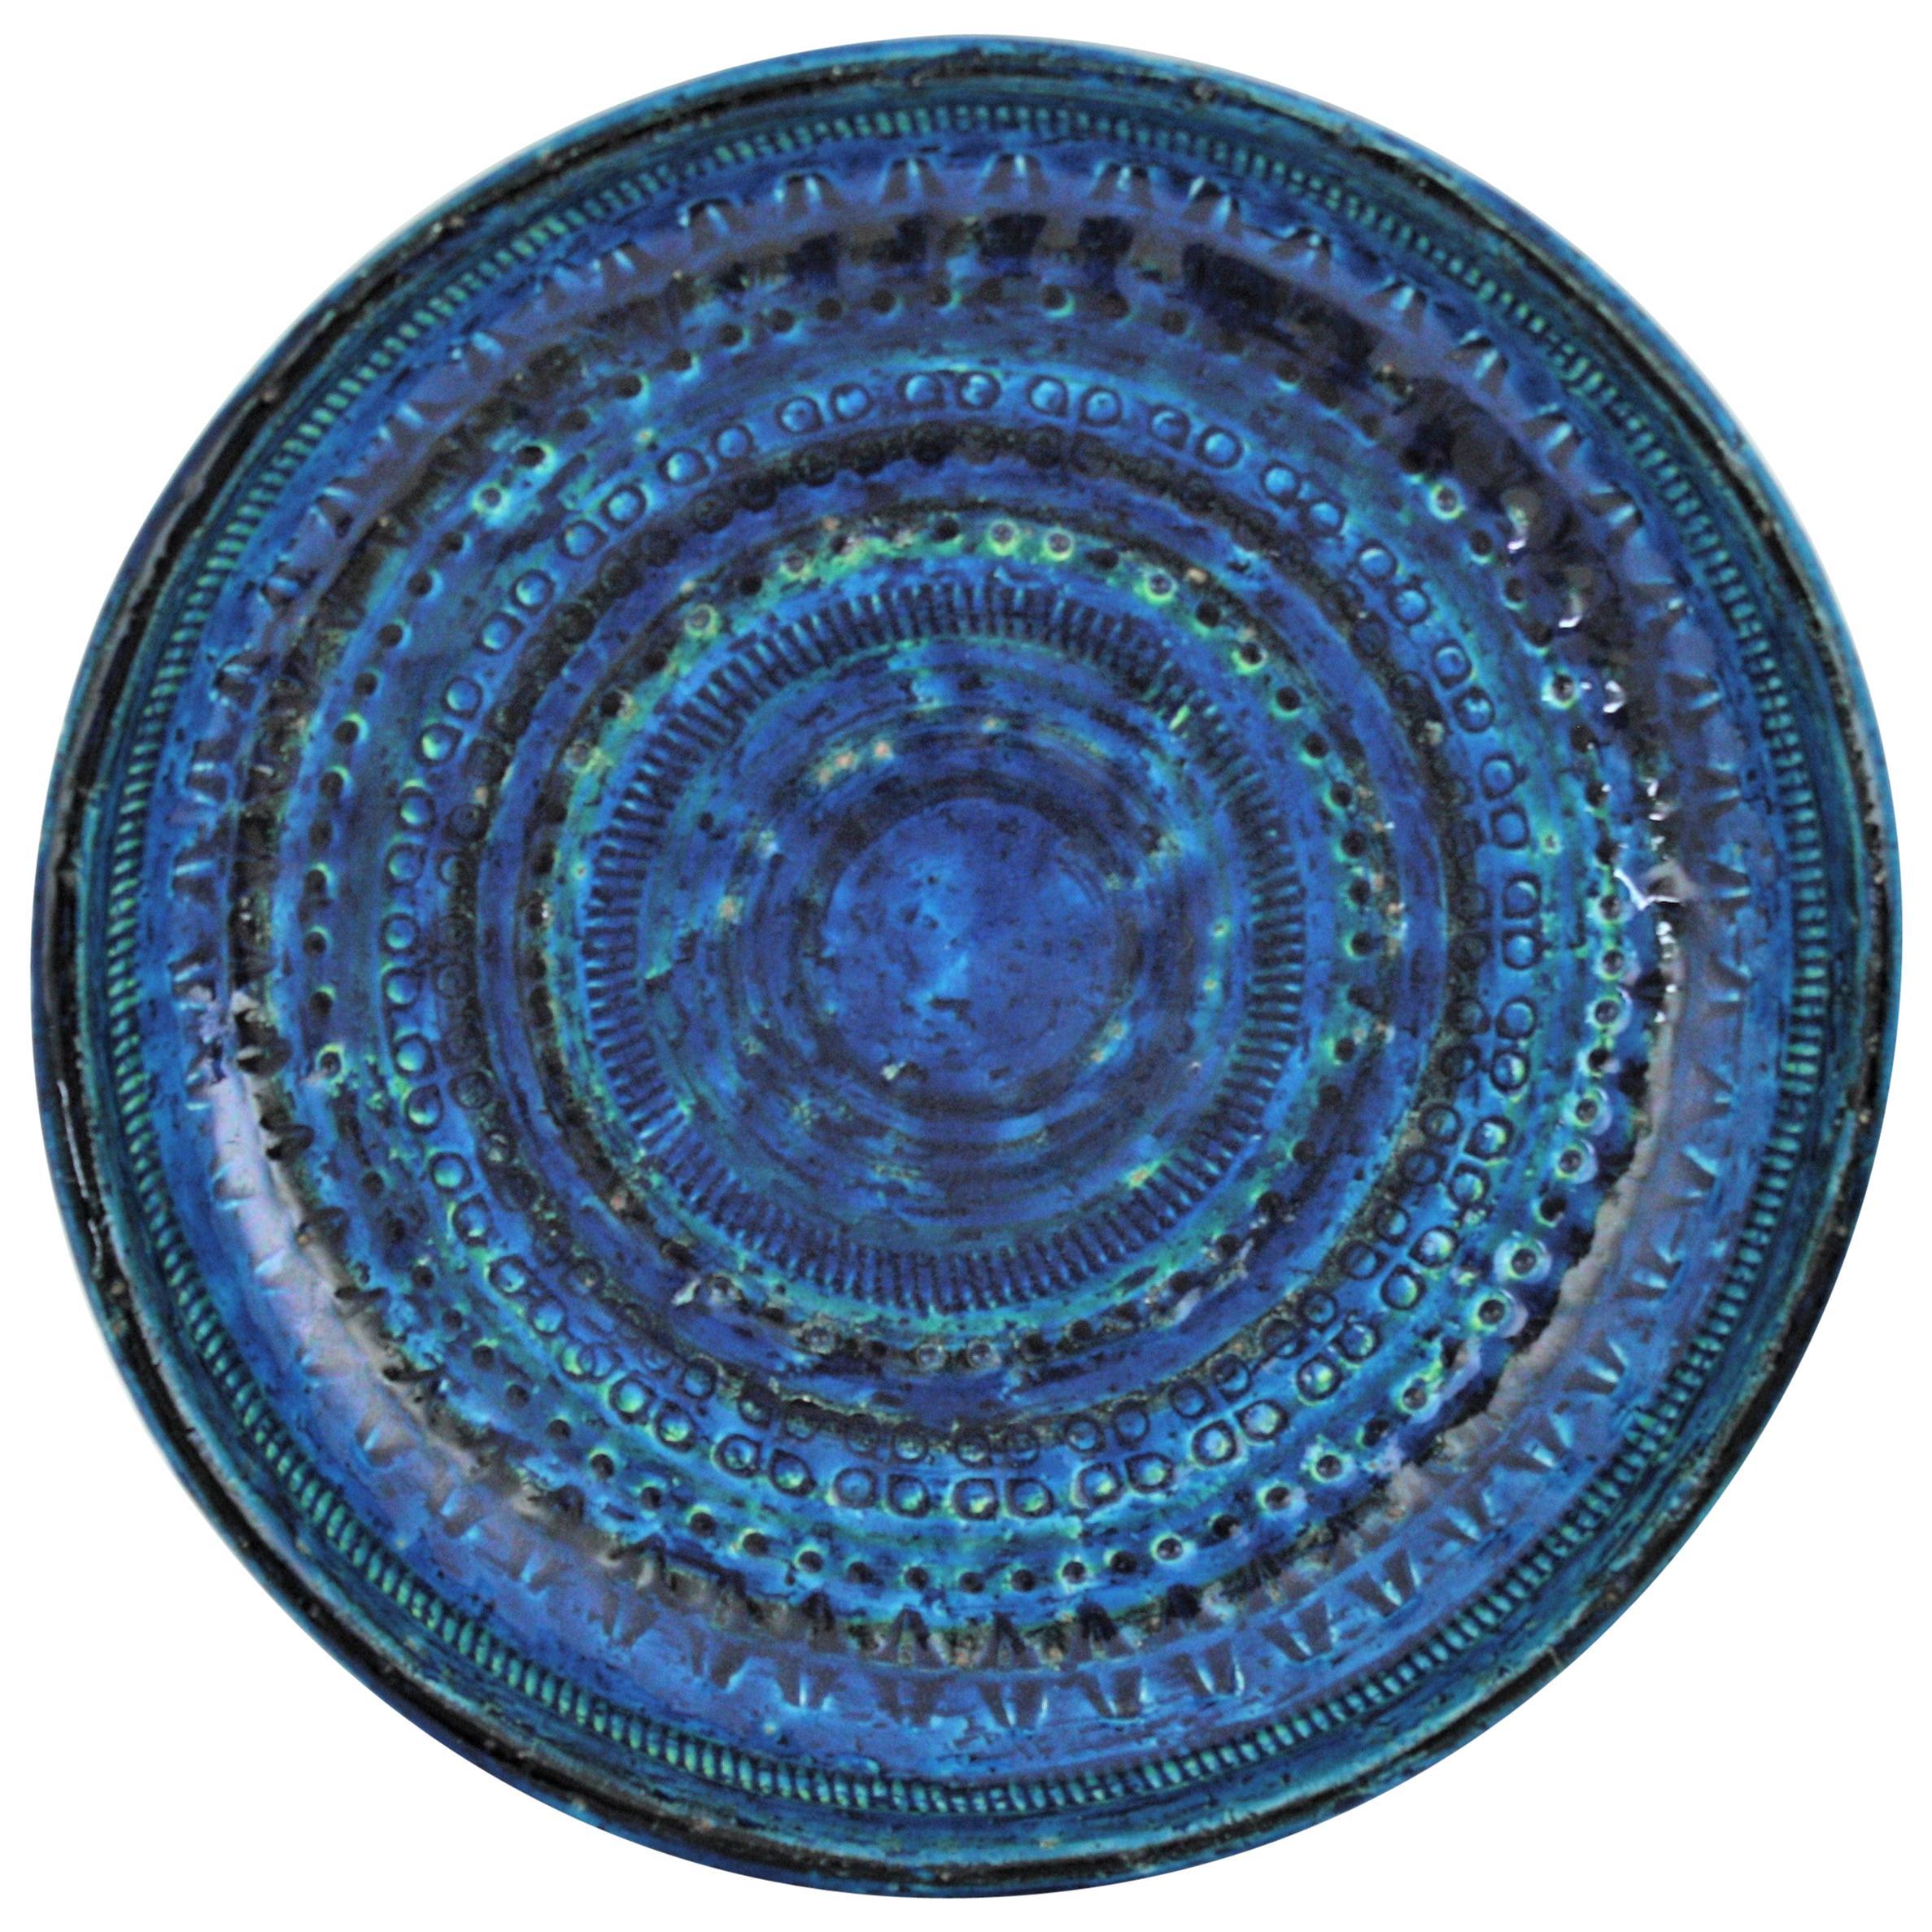 Aldo Londi Bitossi Rimini Blue Glazed Ceramic Round Dish or Bowl, Italy, 1950s